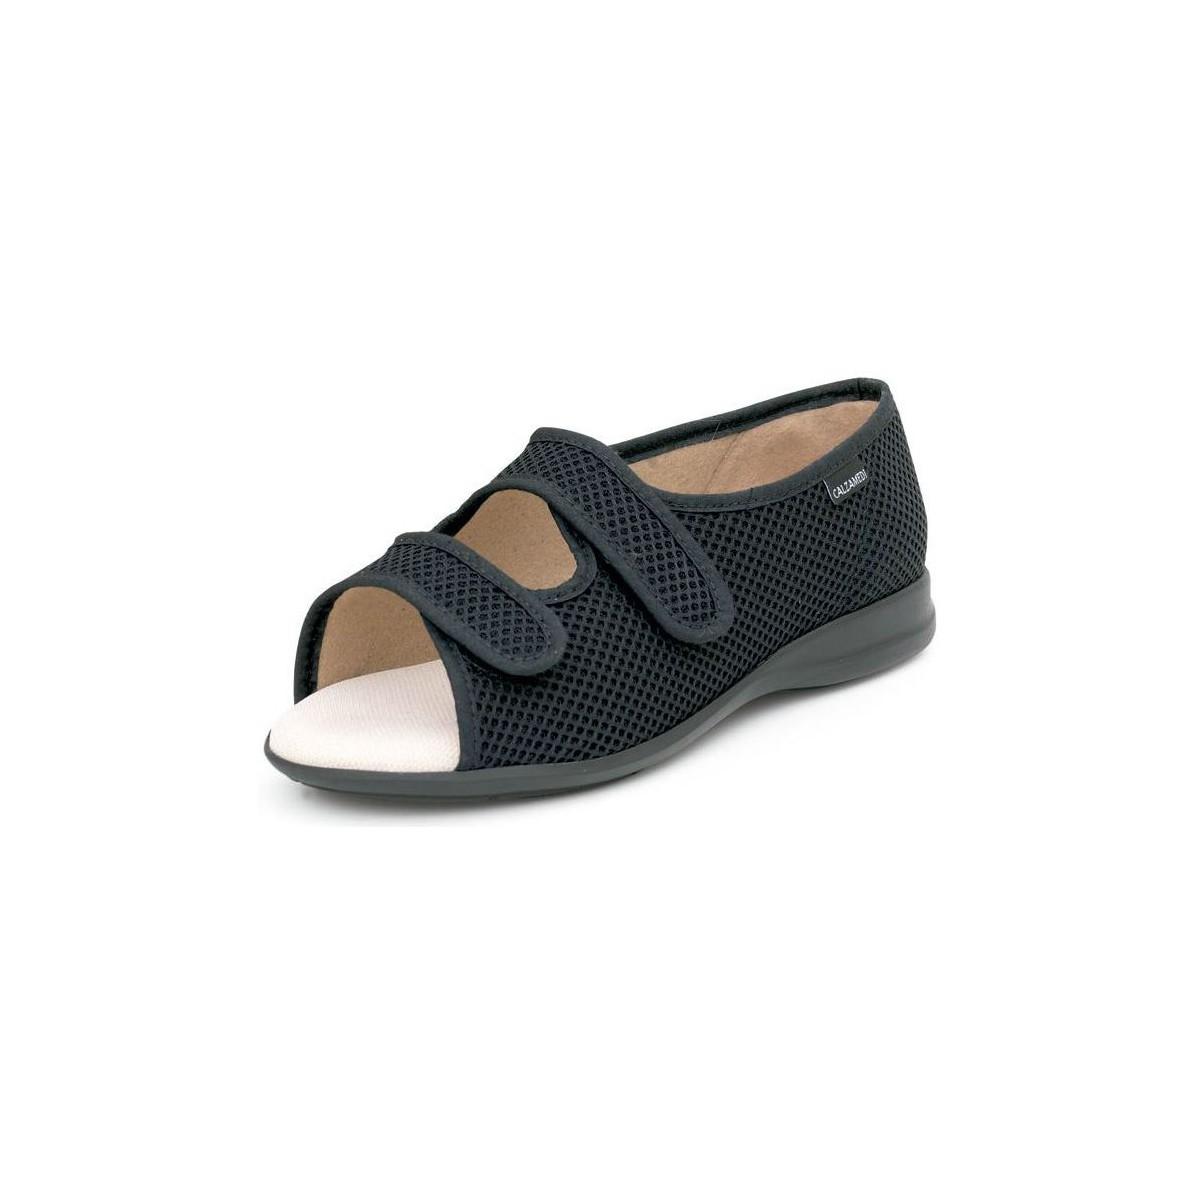 calzamedi velcro ouverte sandale orthop dique noir chaussures sandale femme 89 05. Black Bedroom Furniture Sets. Home Design Ideas